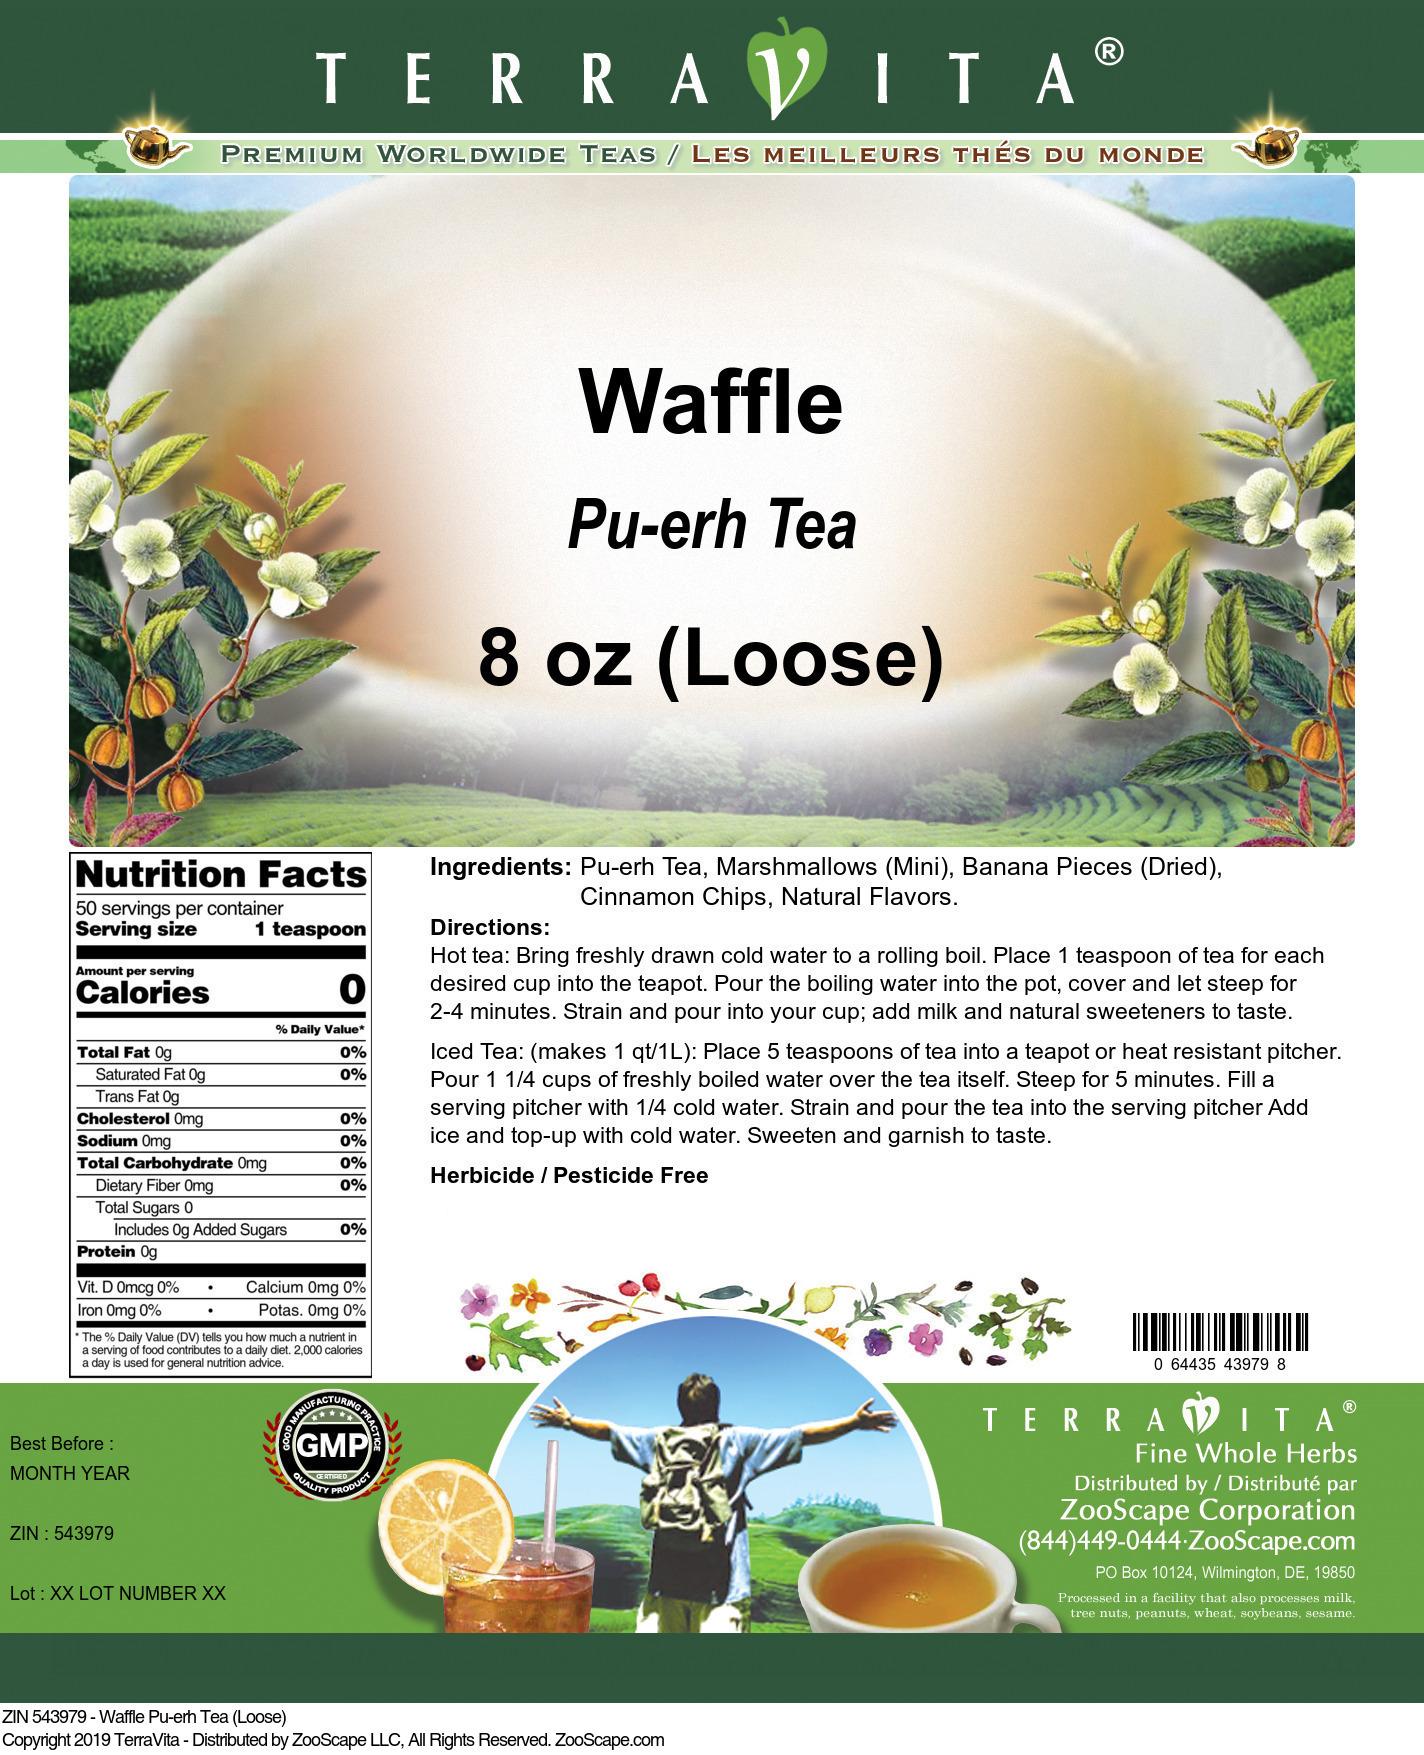 Waffle Pu-erh Tea (Loose)